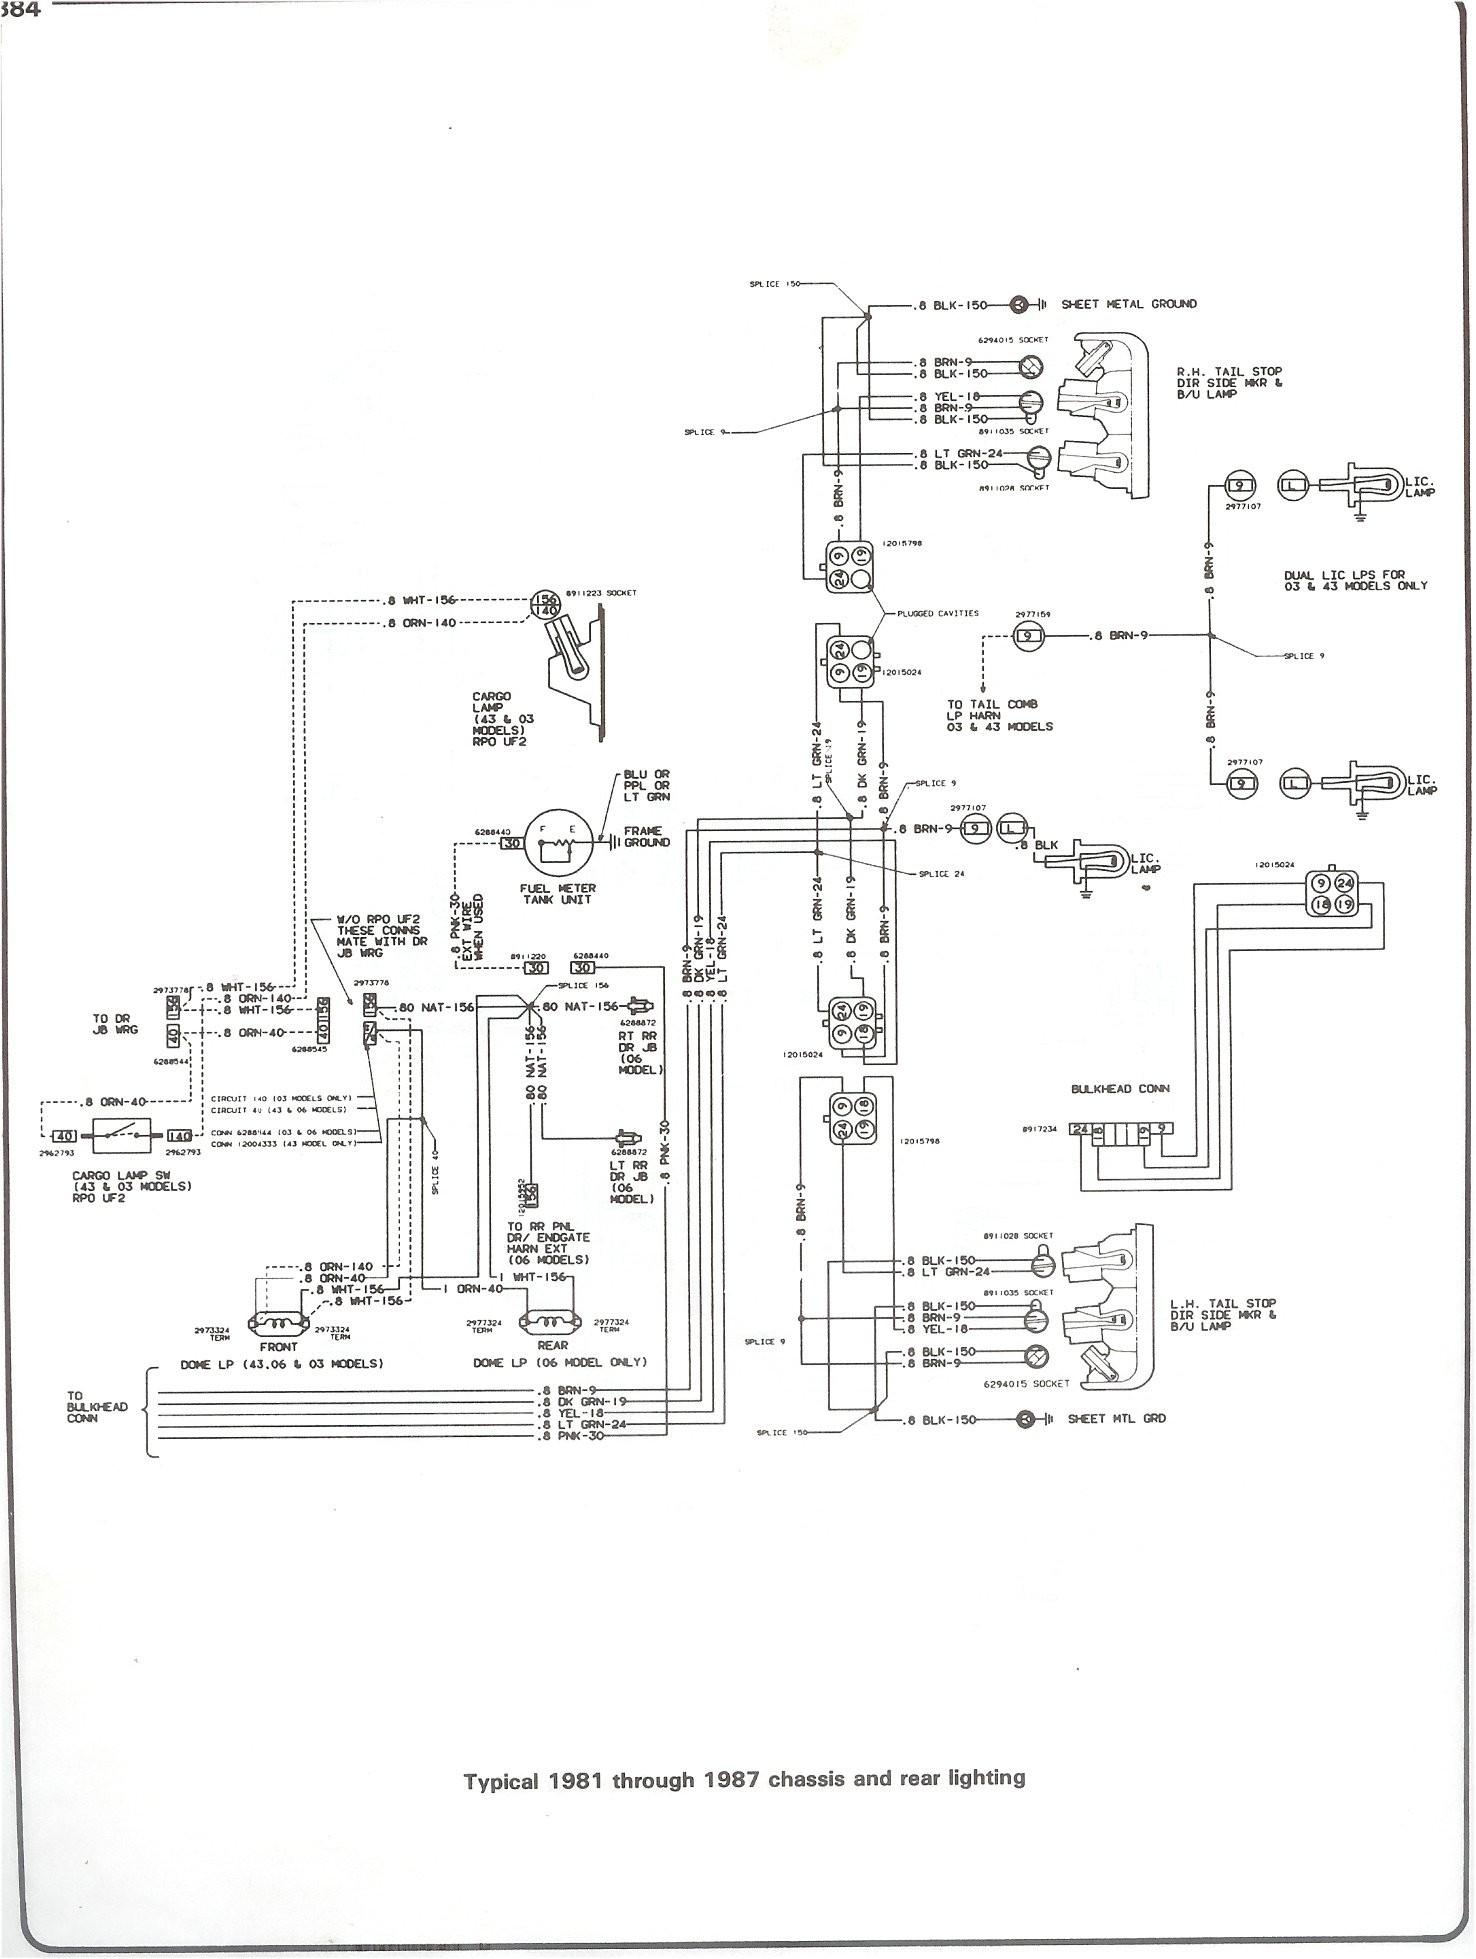 1995 4l80e transmission wiring diagram ford ka 2010 radio 1981 chevy truck fuse box my